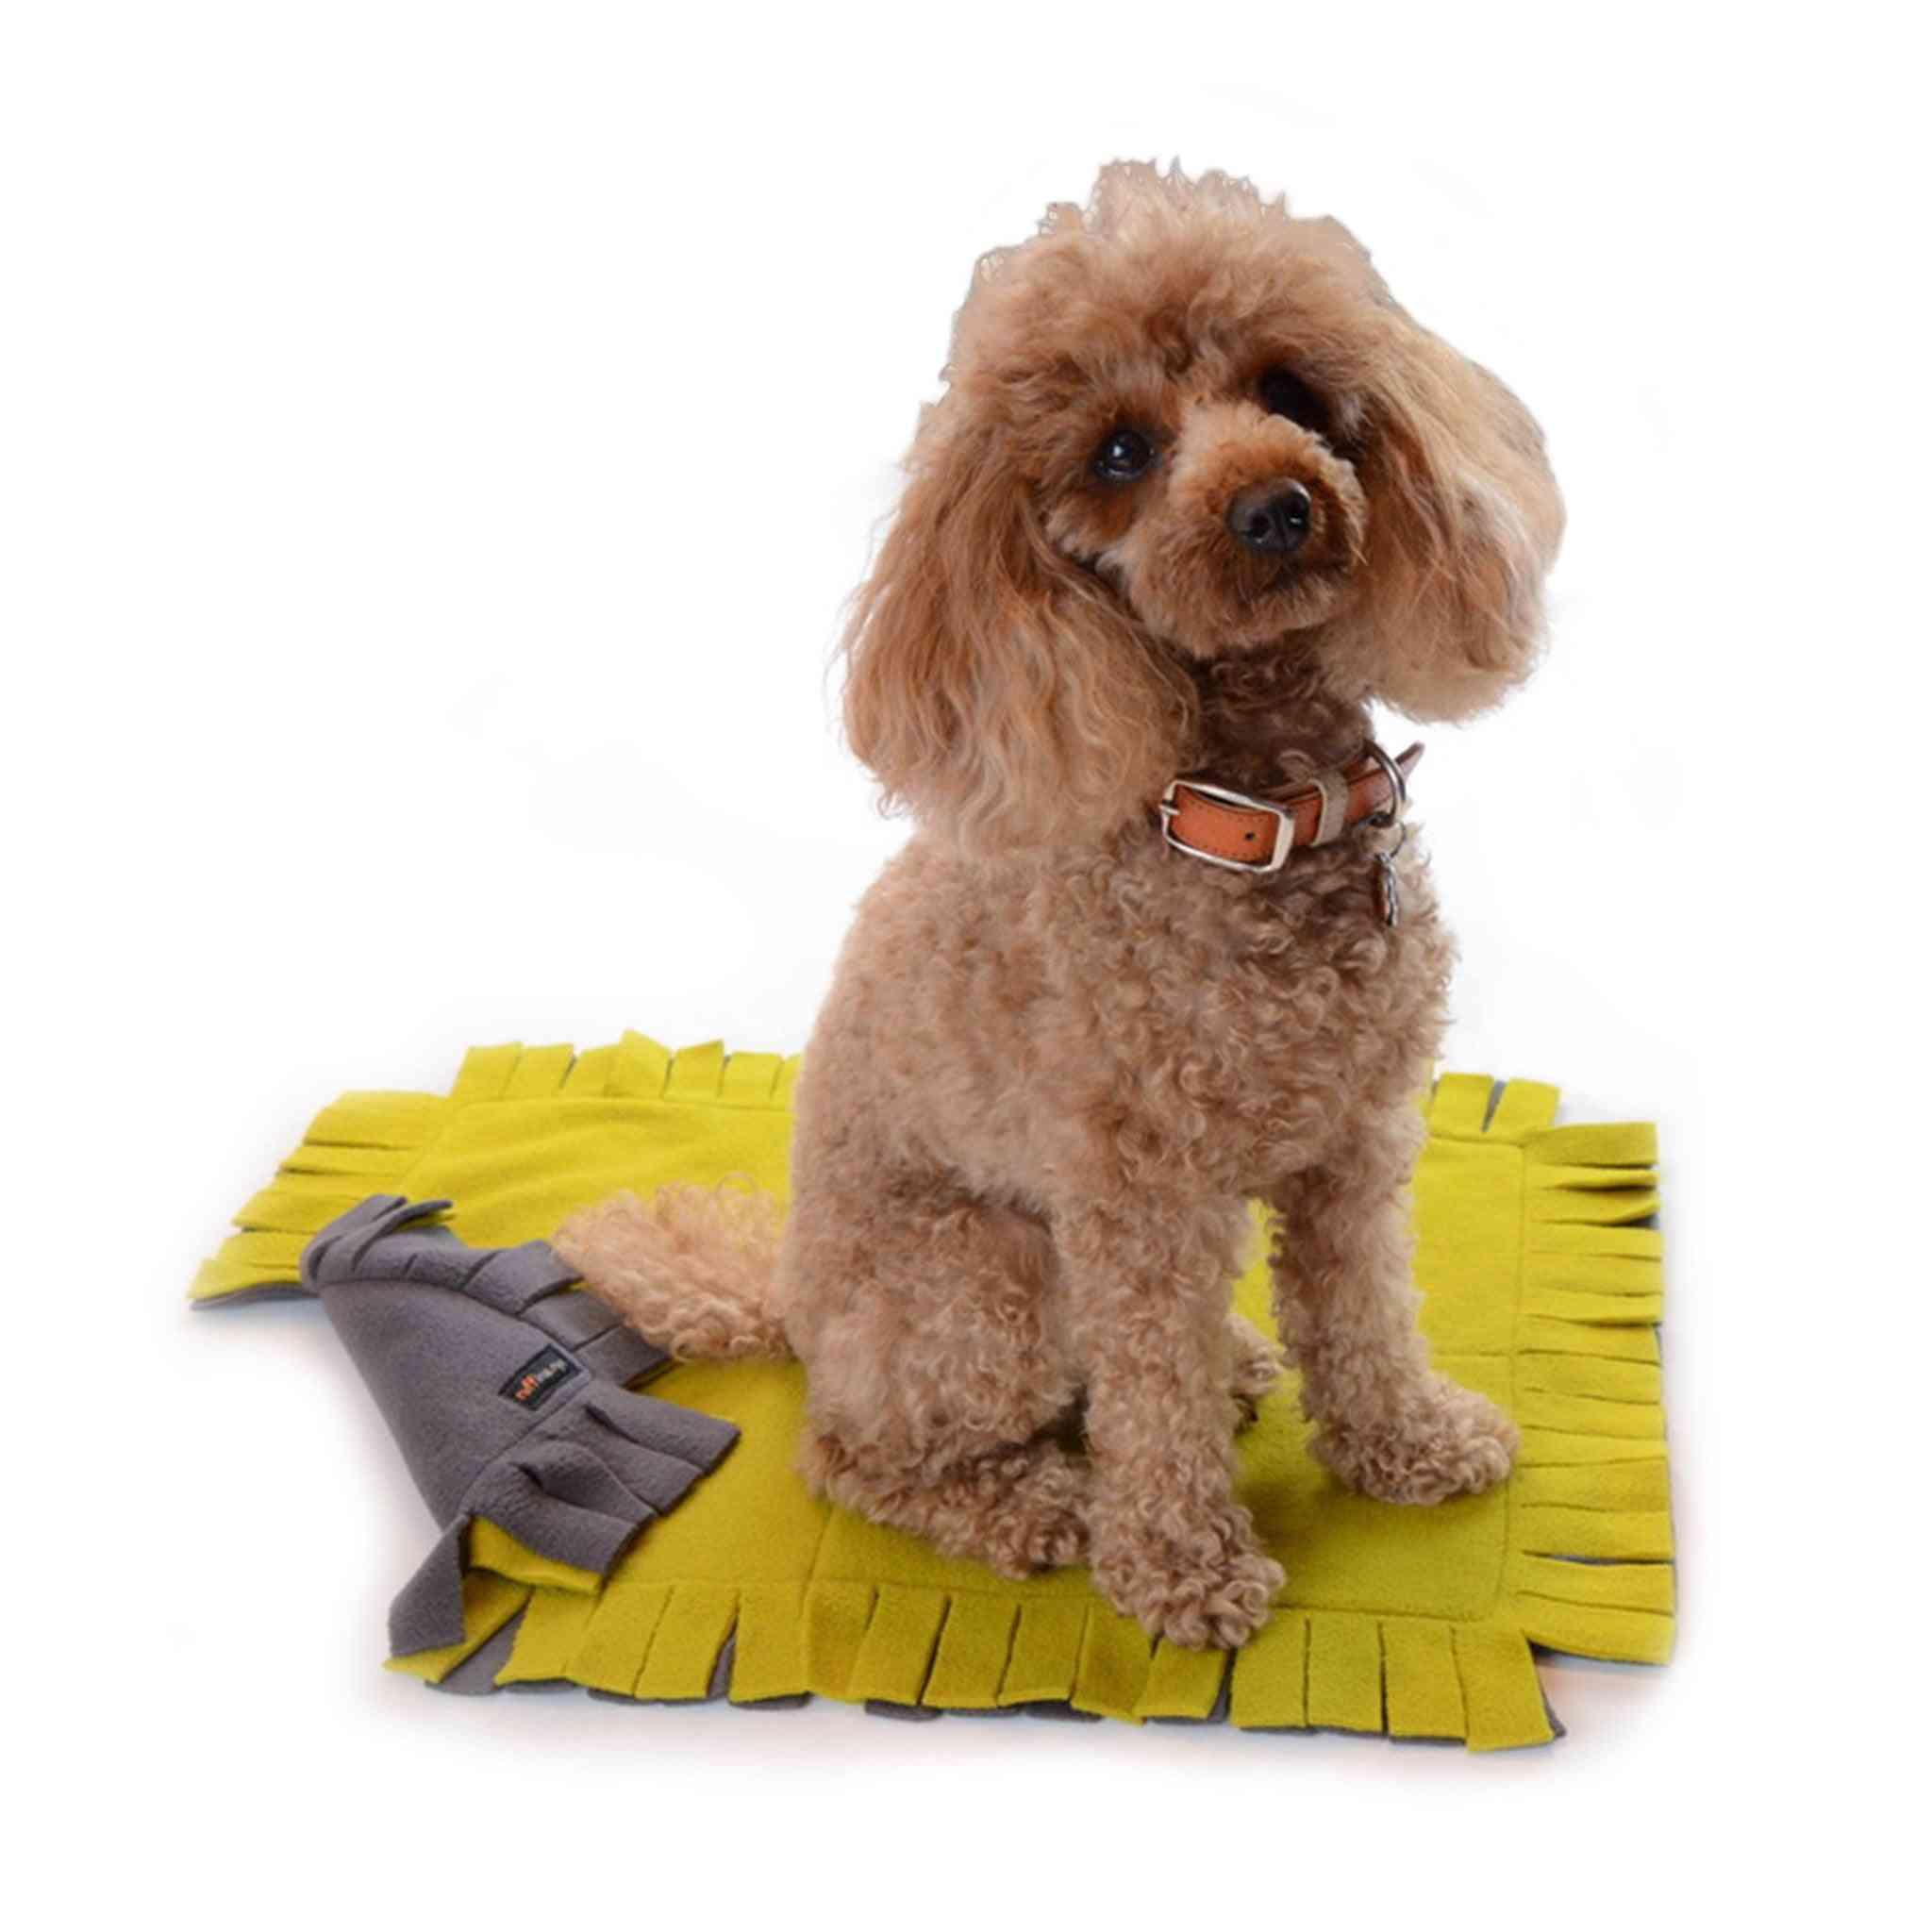 Little Dog Blanket - Small